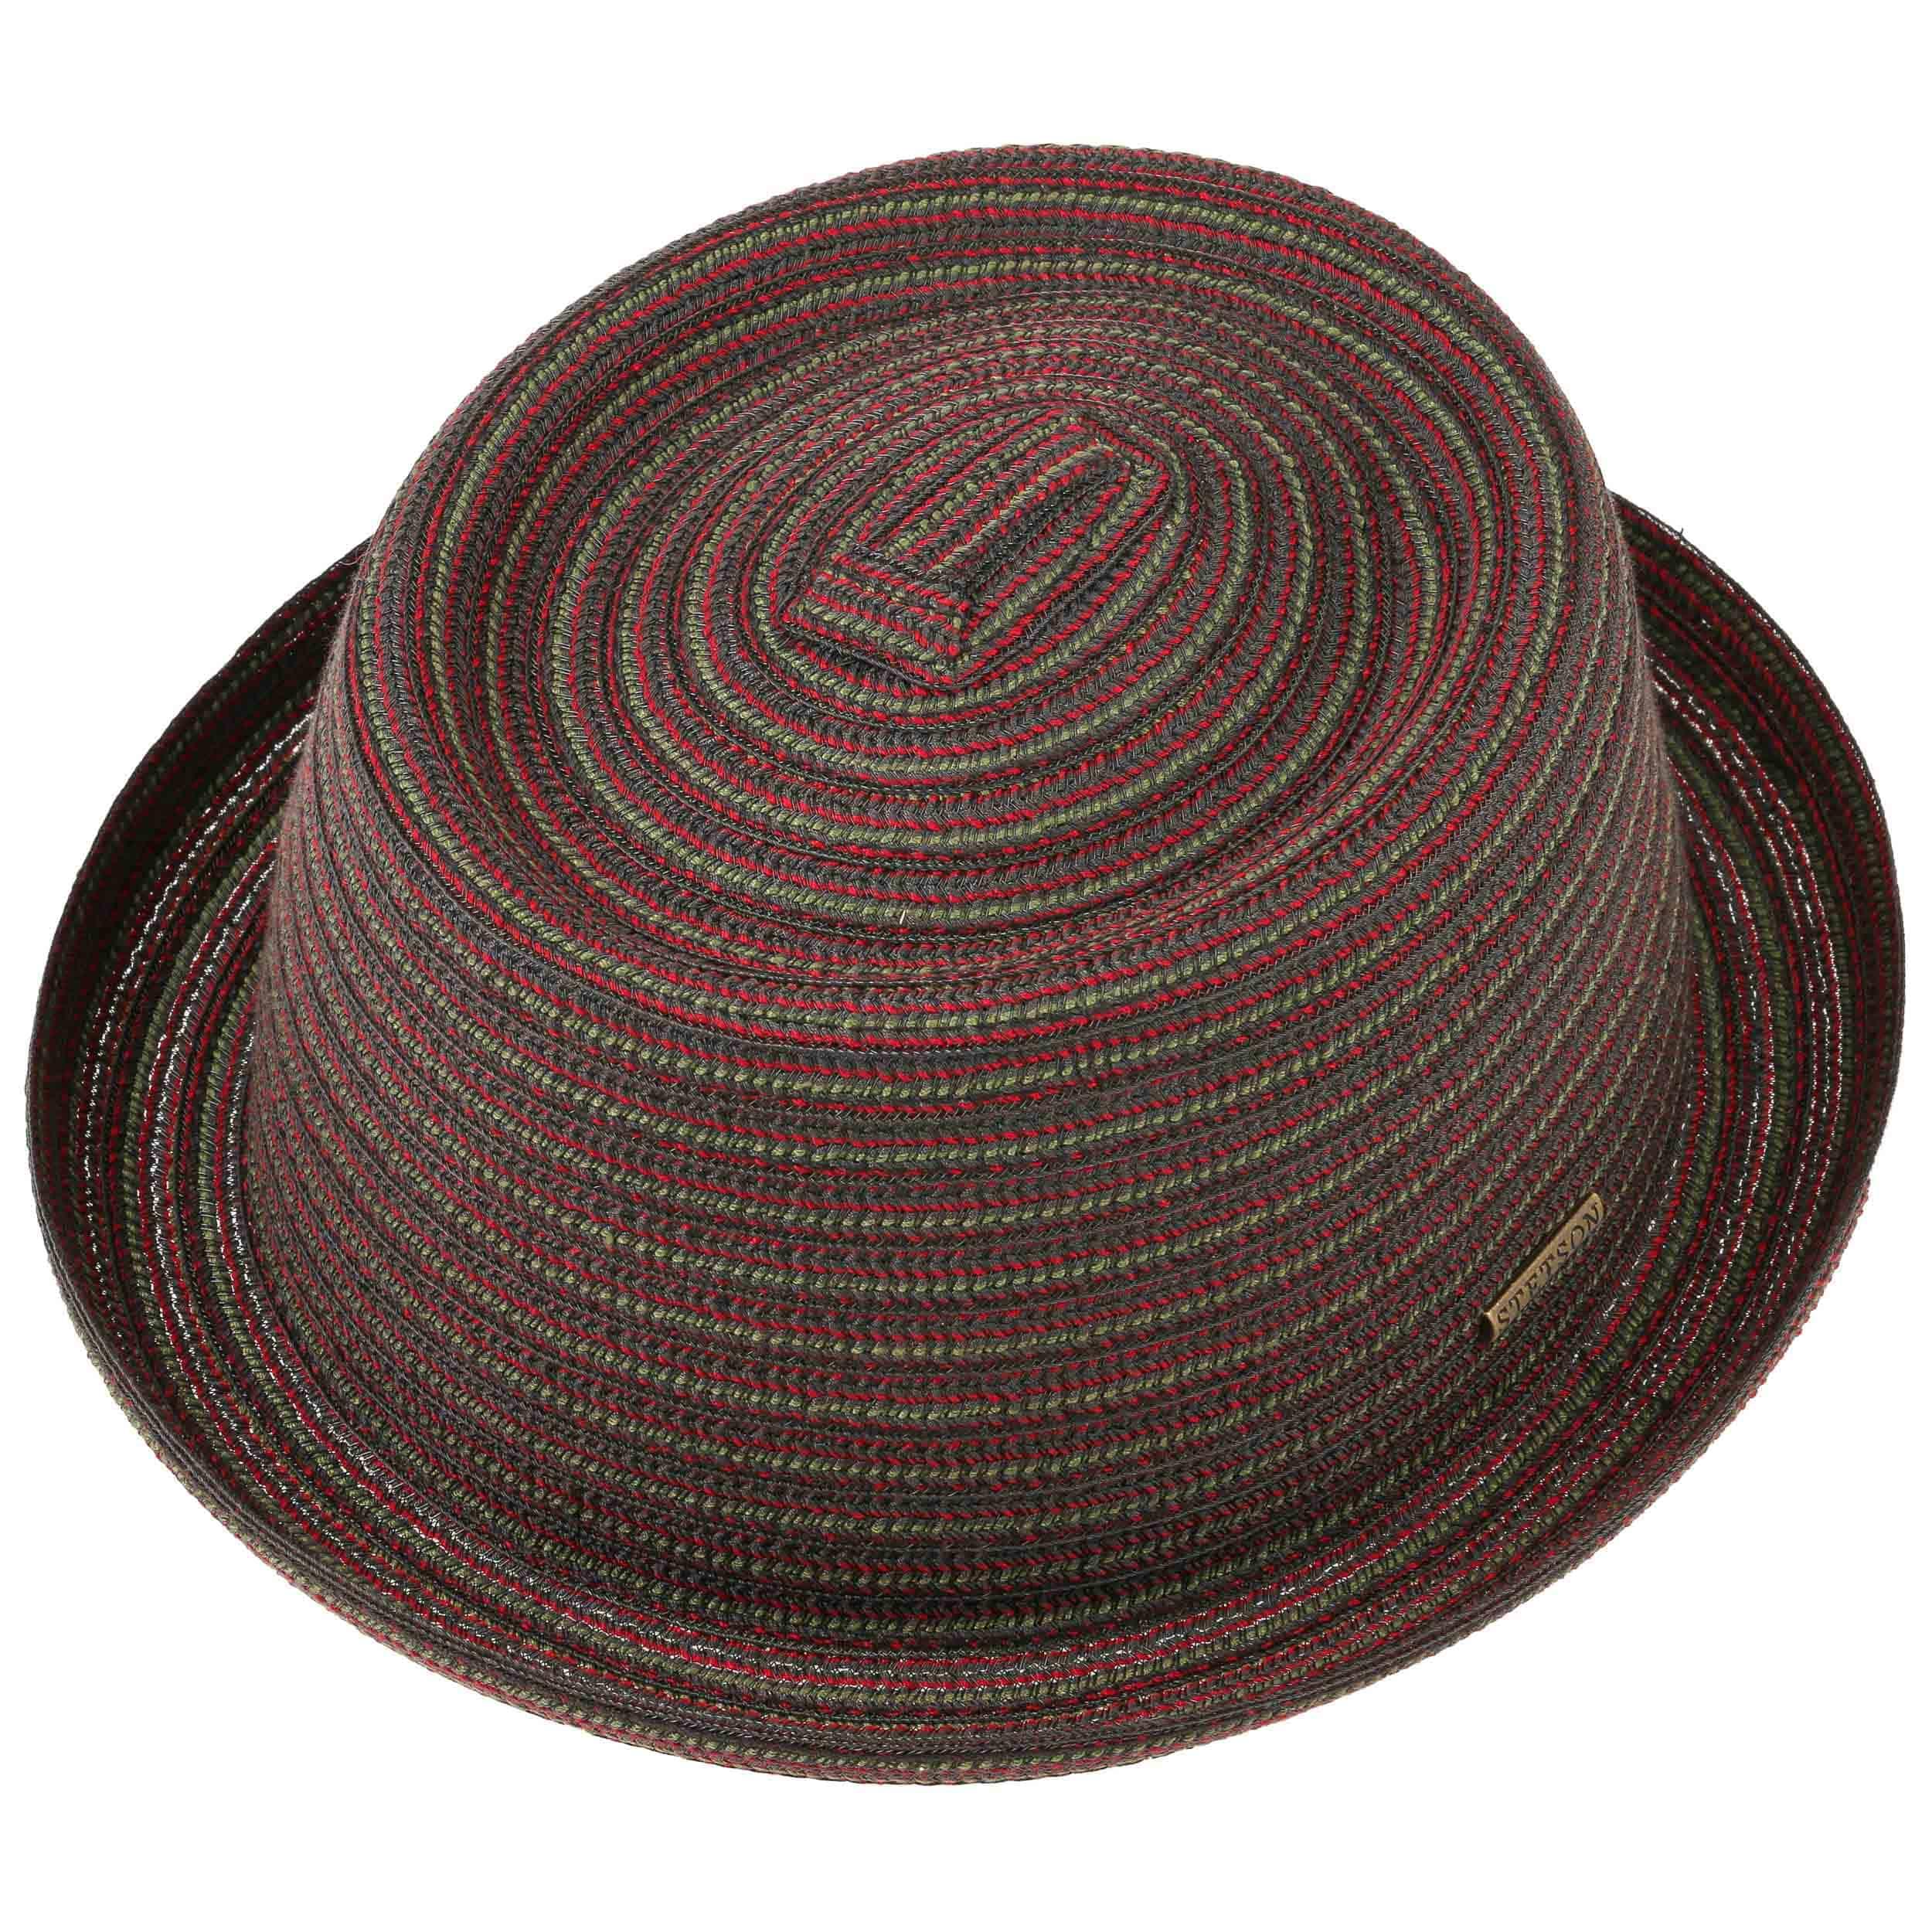 Pico Pork Pie Cloth Hat by Stetson - black-red 1 ... d868544d8e19